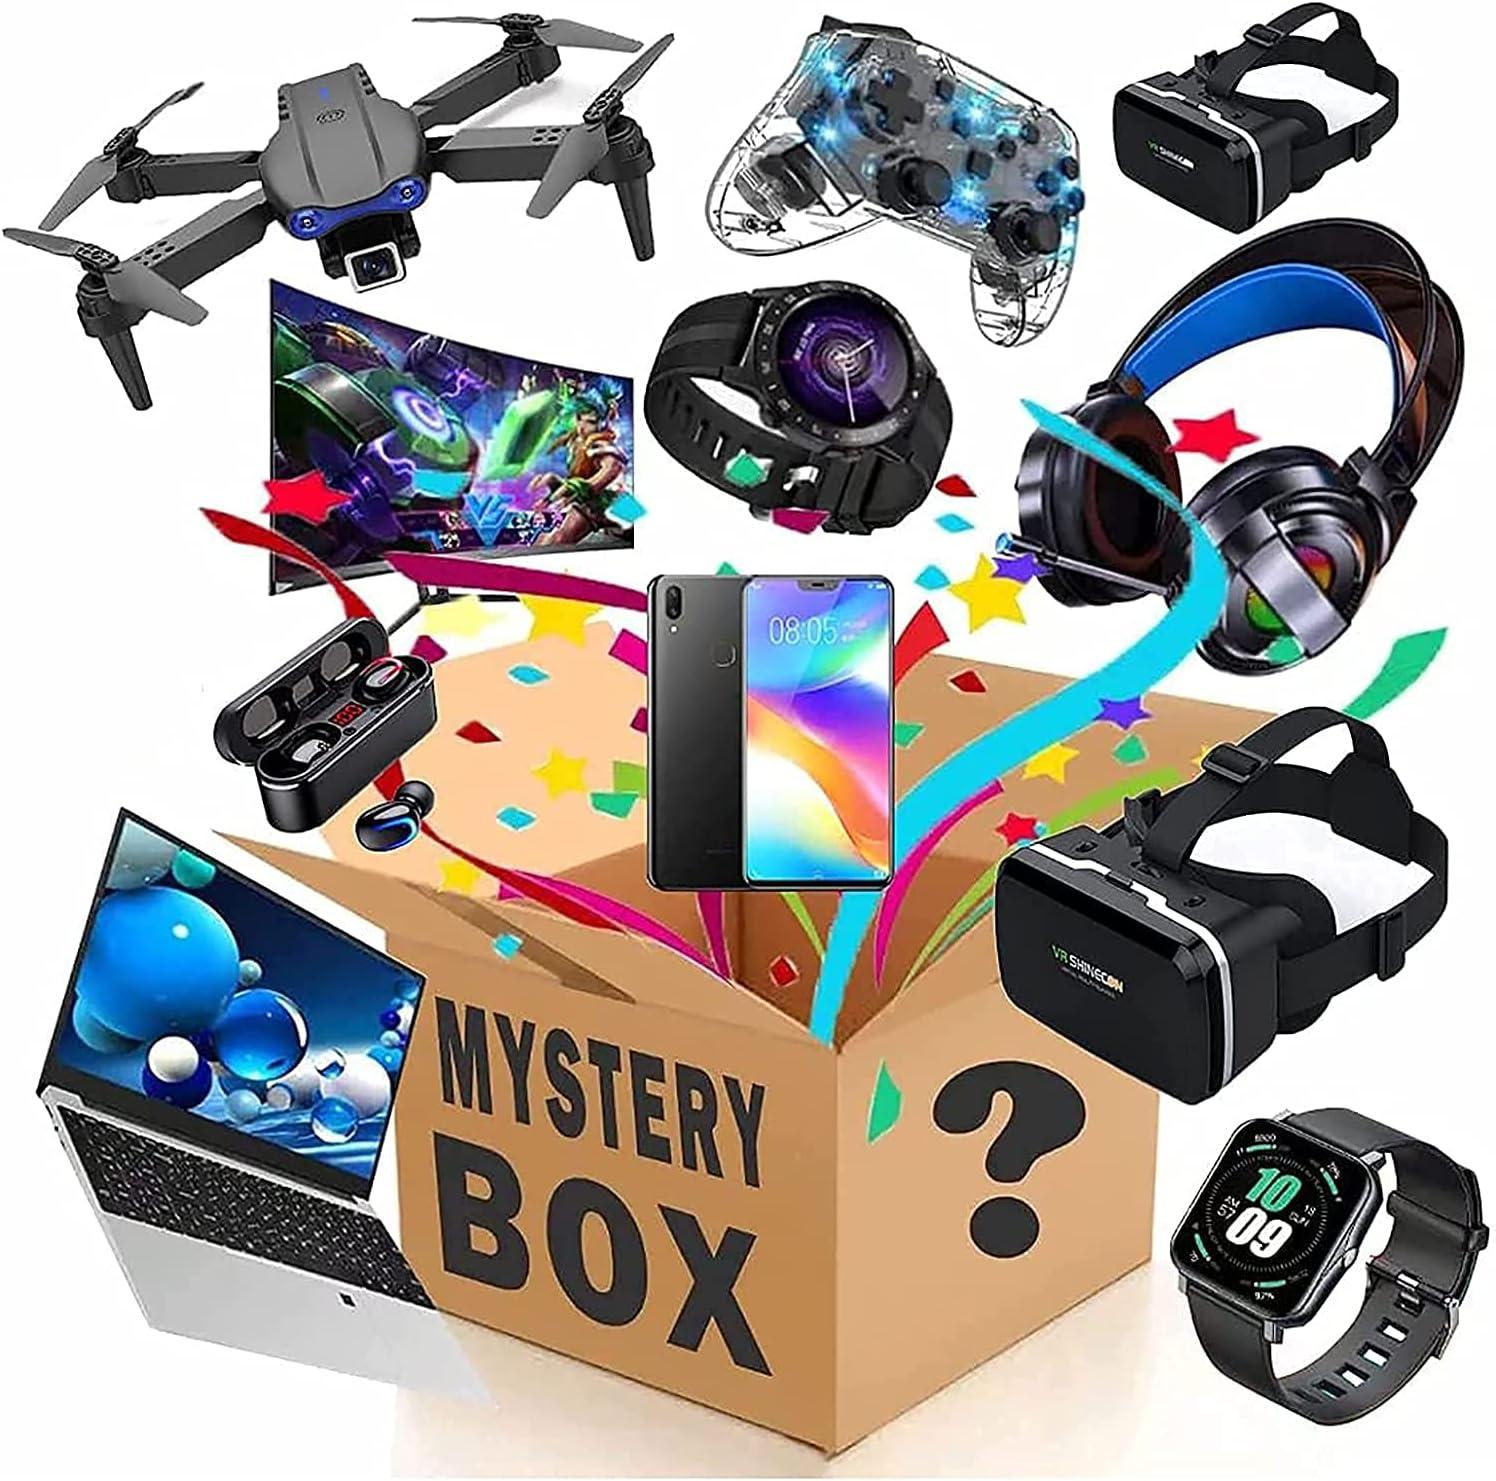 Mystery Miami Mall Box Electronics Random OFFer Birt Boxes